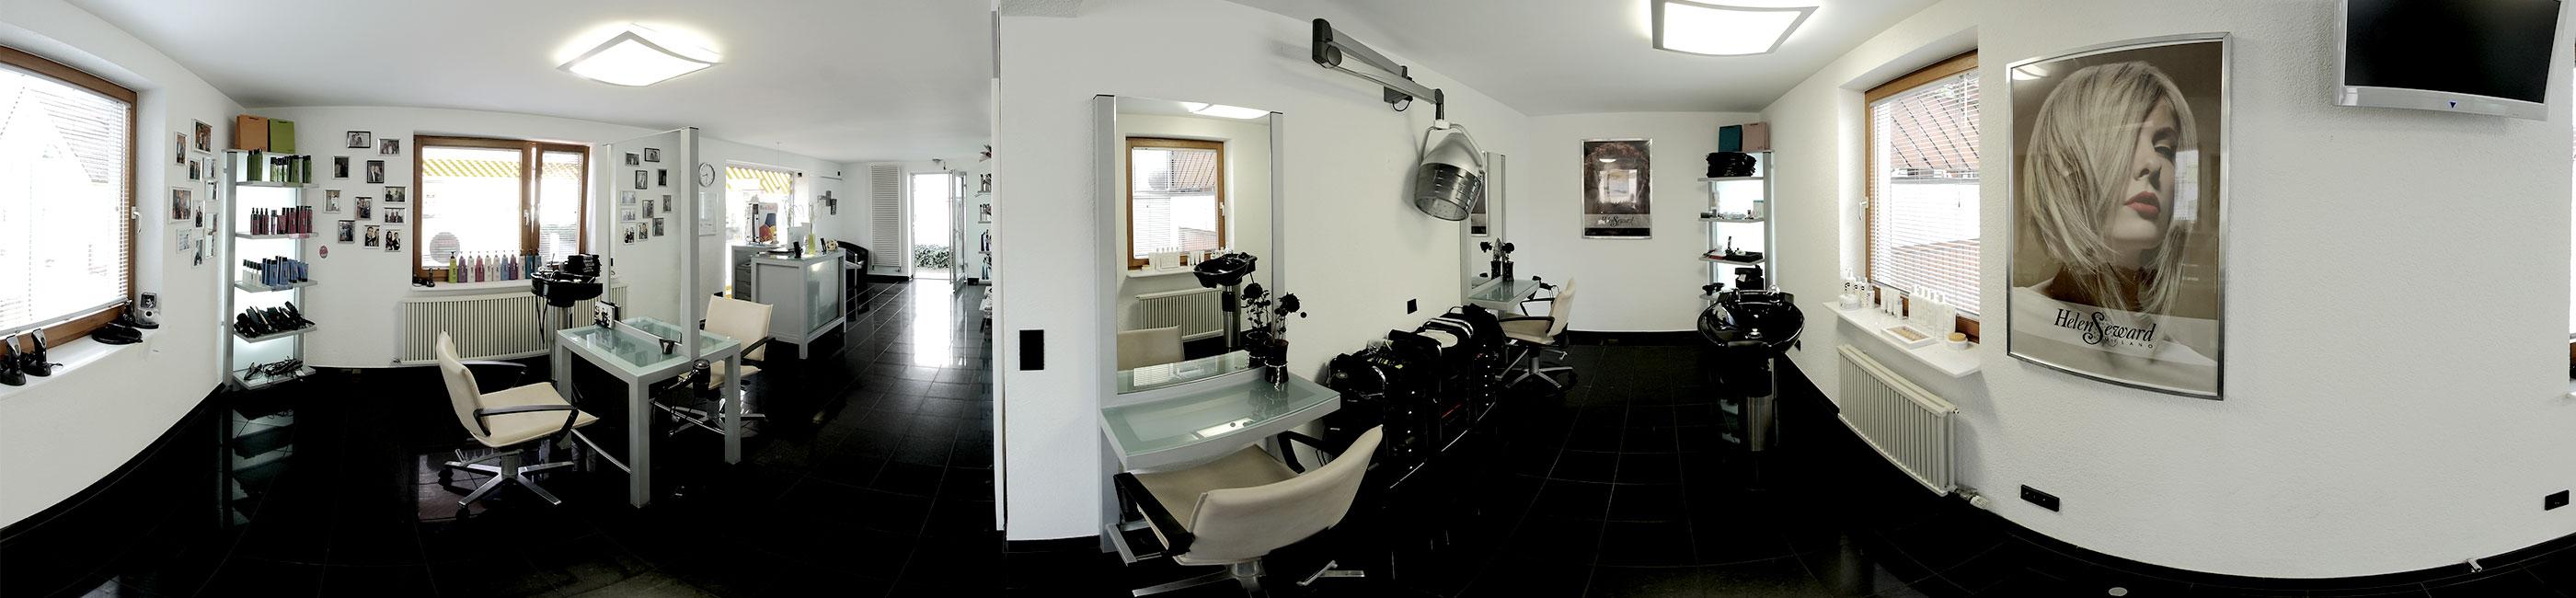 impressum inn style der friseur aus heilbronn. Black Bedroom Furniture Sets. Home Design Ideas